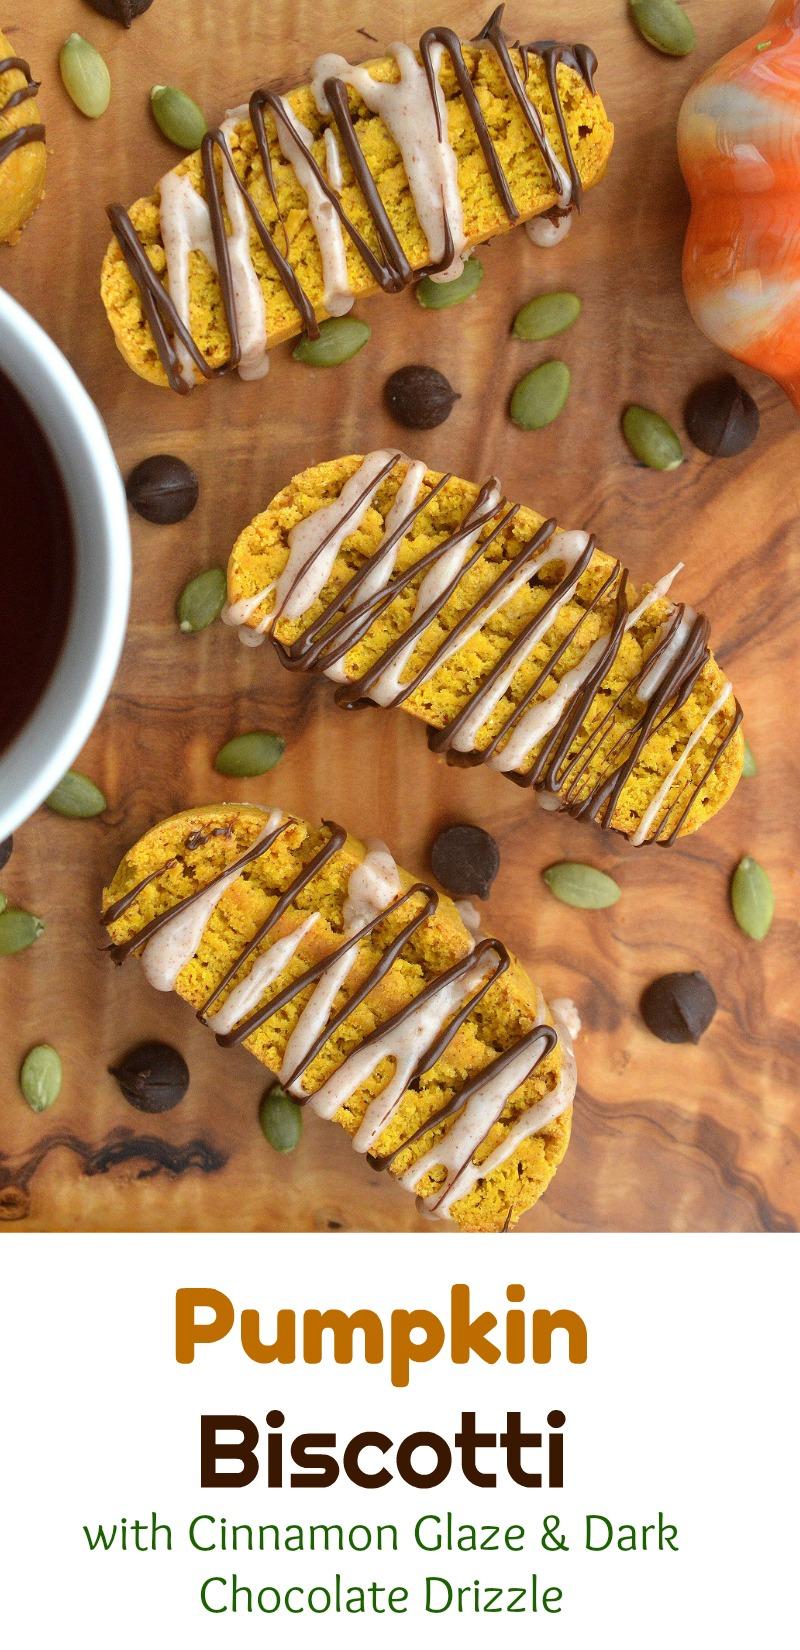 So good (and easy to make!!) Pumpkin Biscotti Recipe with Cinnamon Glaze & Dark Chocolate Drizzle